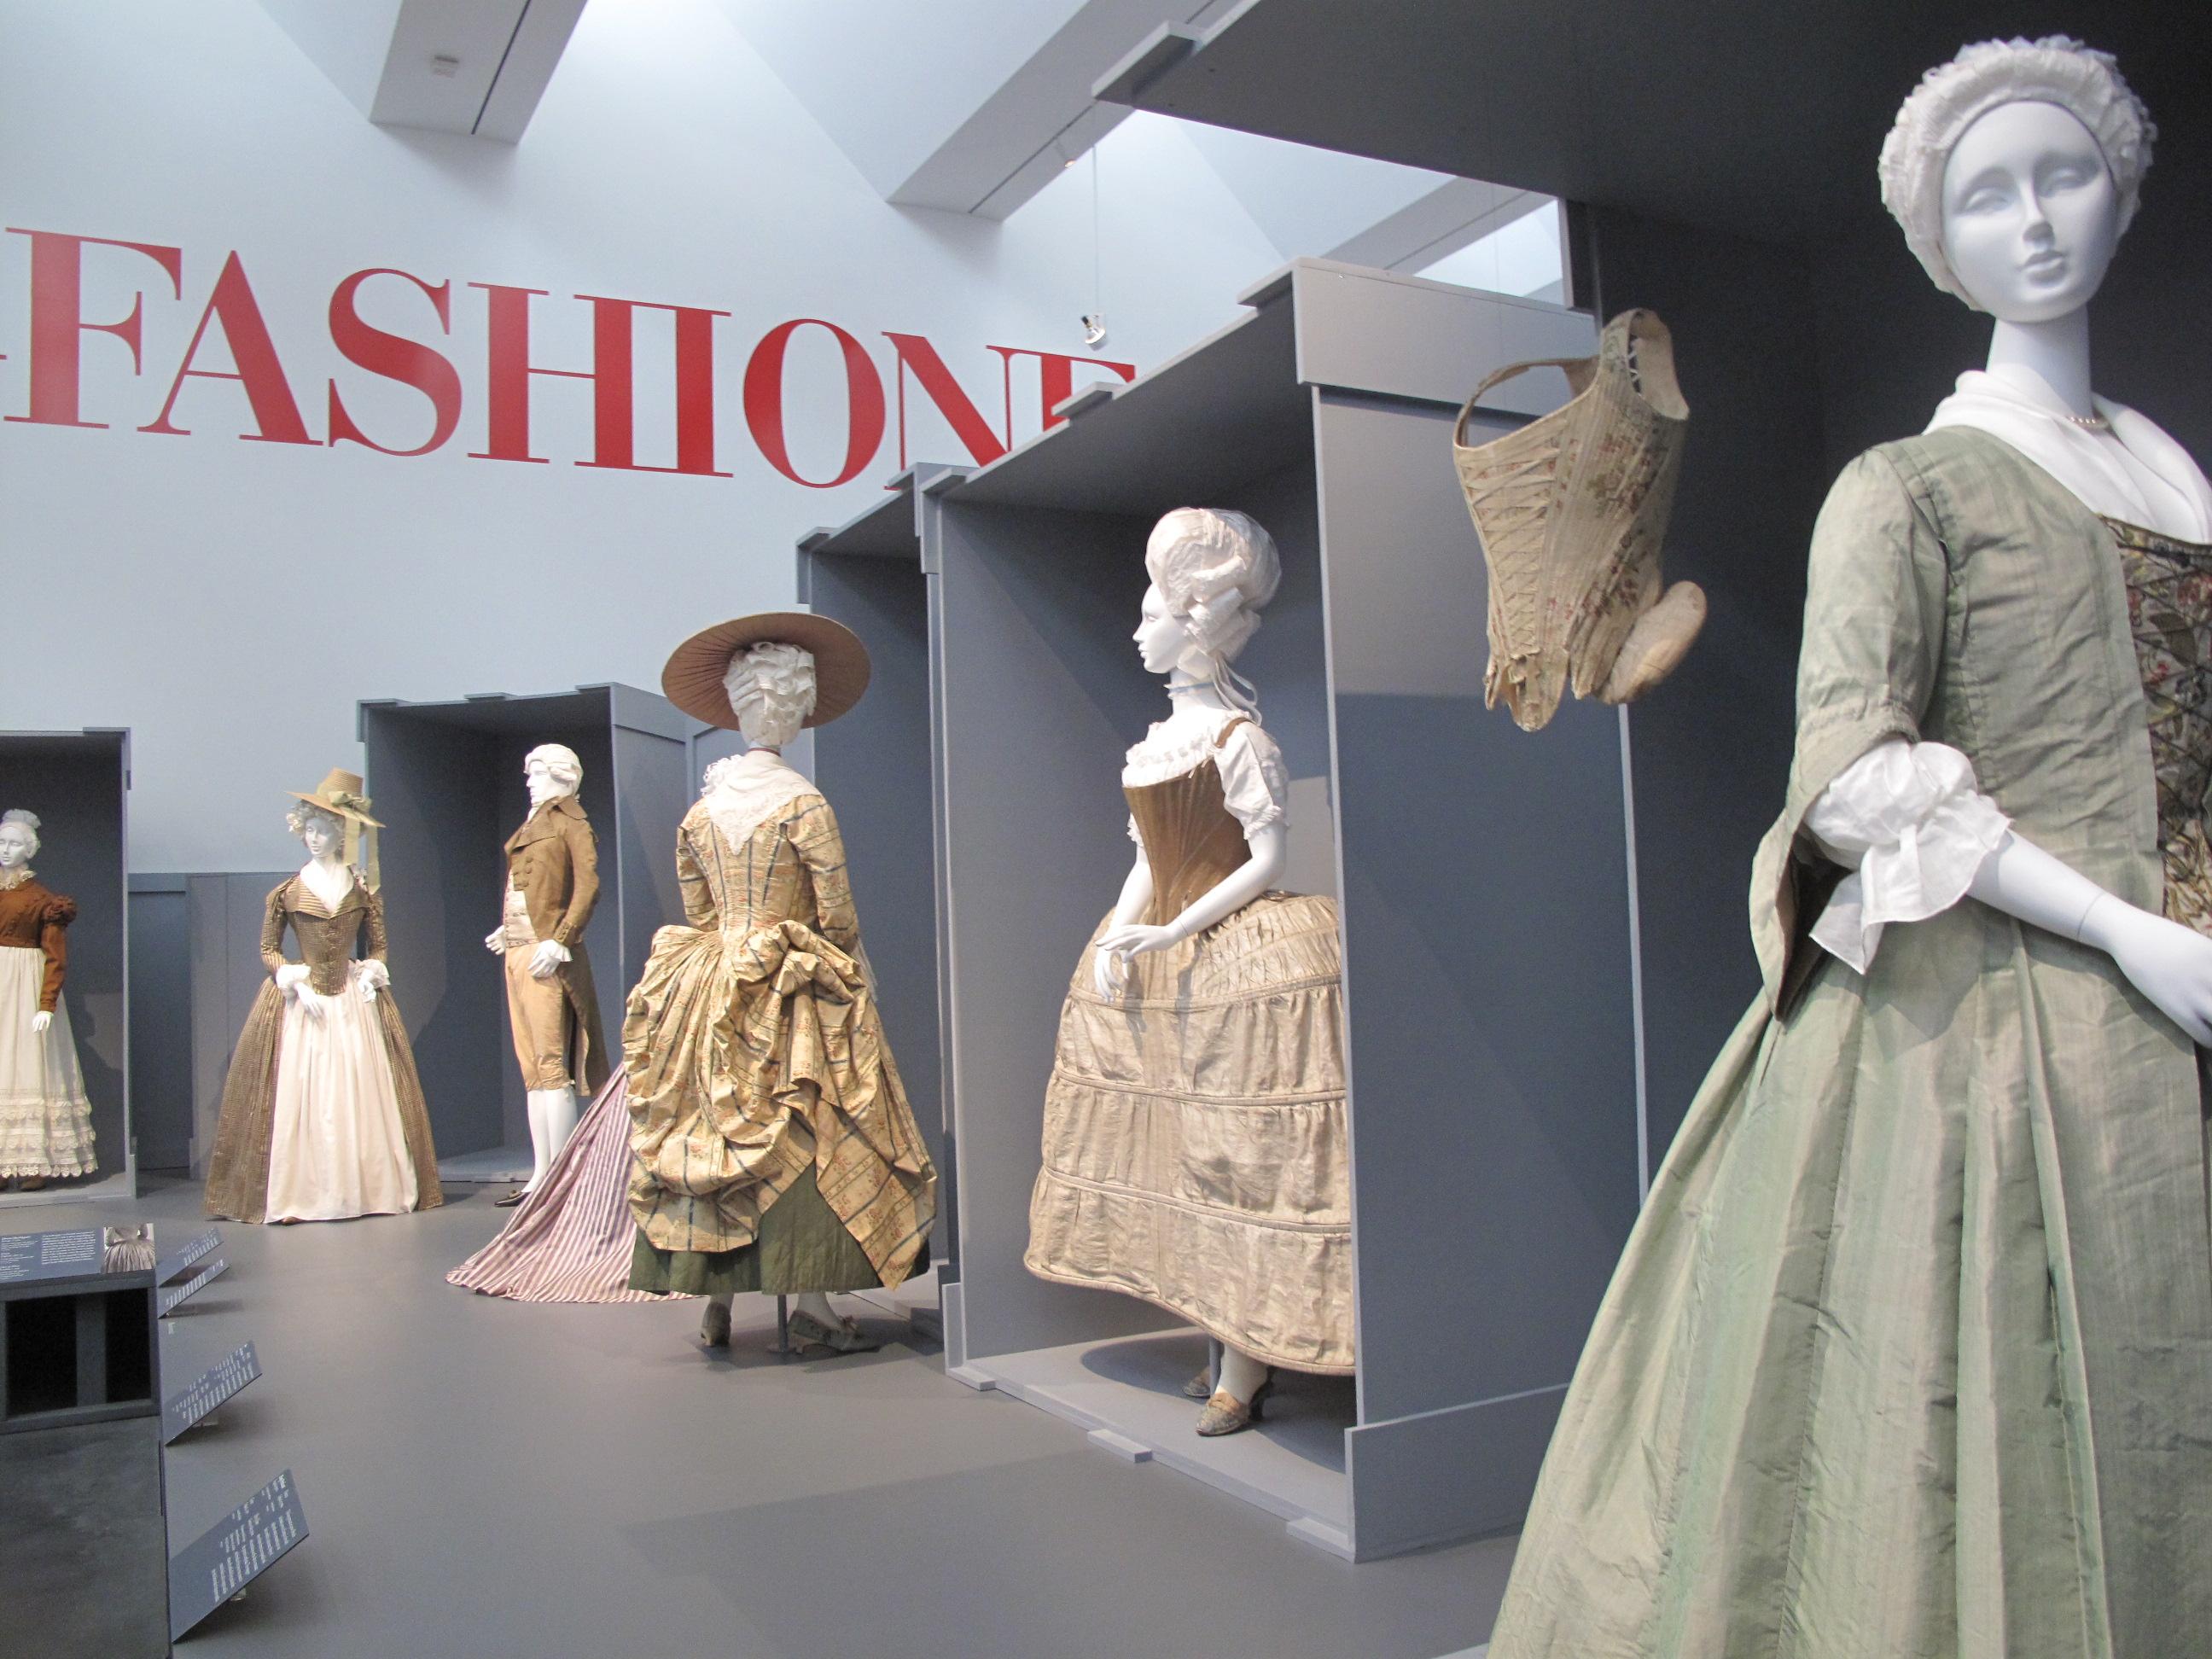 "Fashion Exhibition Booth : Museum stories ""fashioning fashion exhibition at lacma"